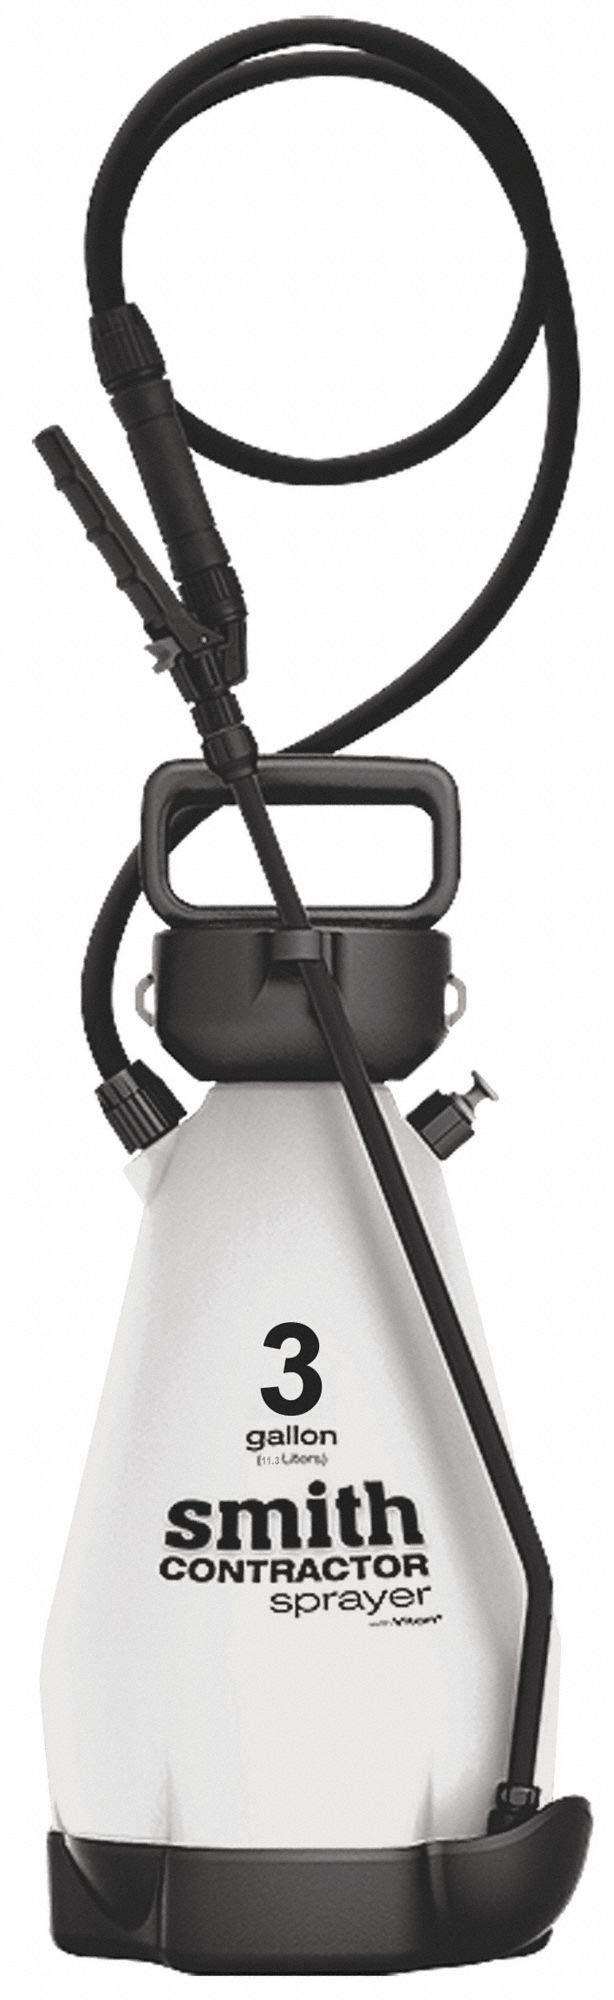 Shoulder Strap Sprayer, Polyethylene Tank Material, 3 gal, 40 psi Max Sprayer Pressure by DB SMITH (Image #1)